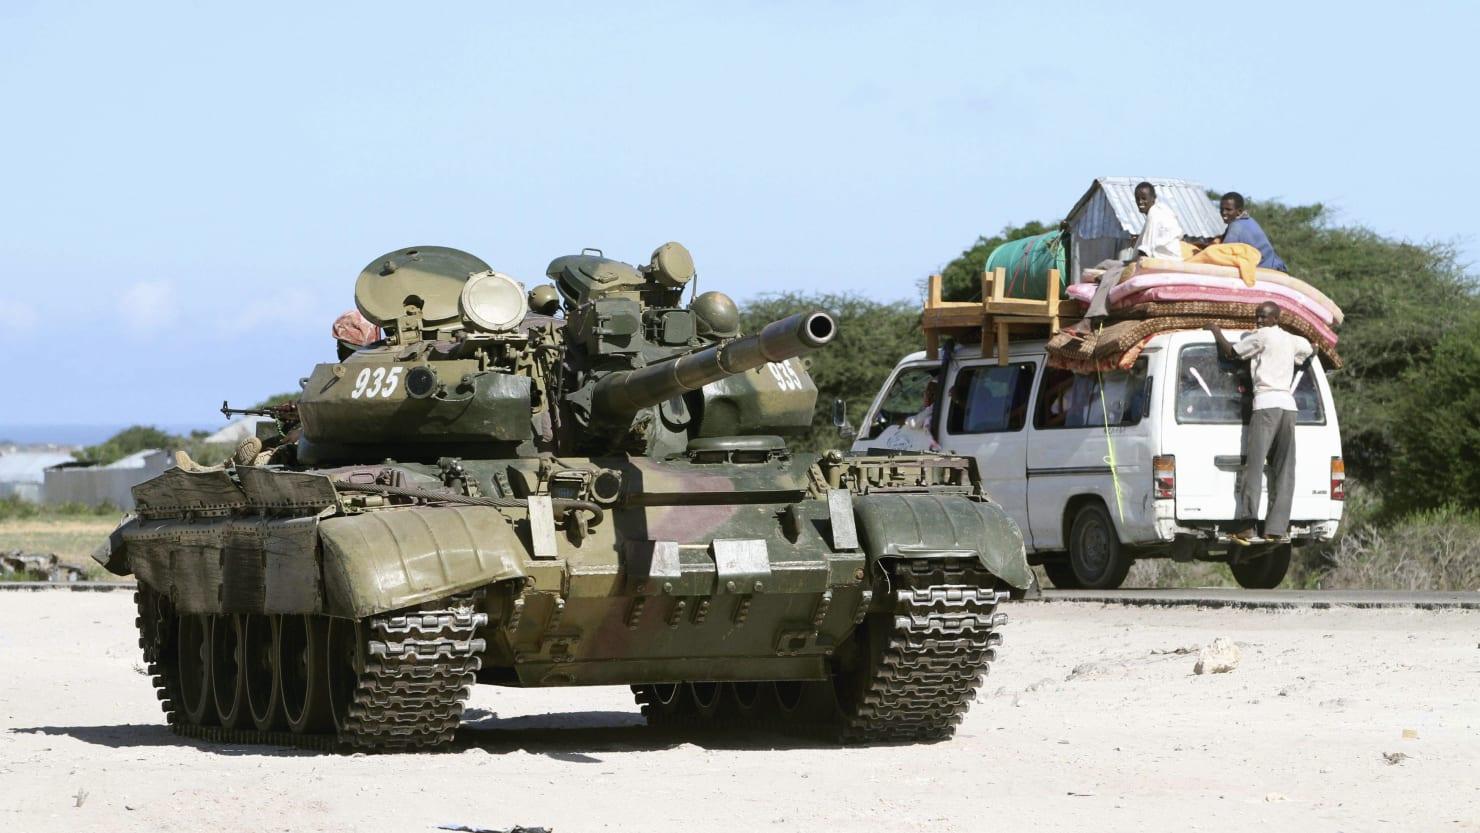 Trump Orders U.S. Troops Out of Somalia Before Inauguration